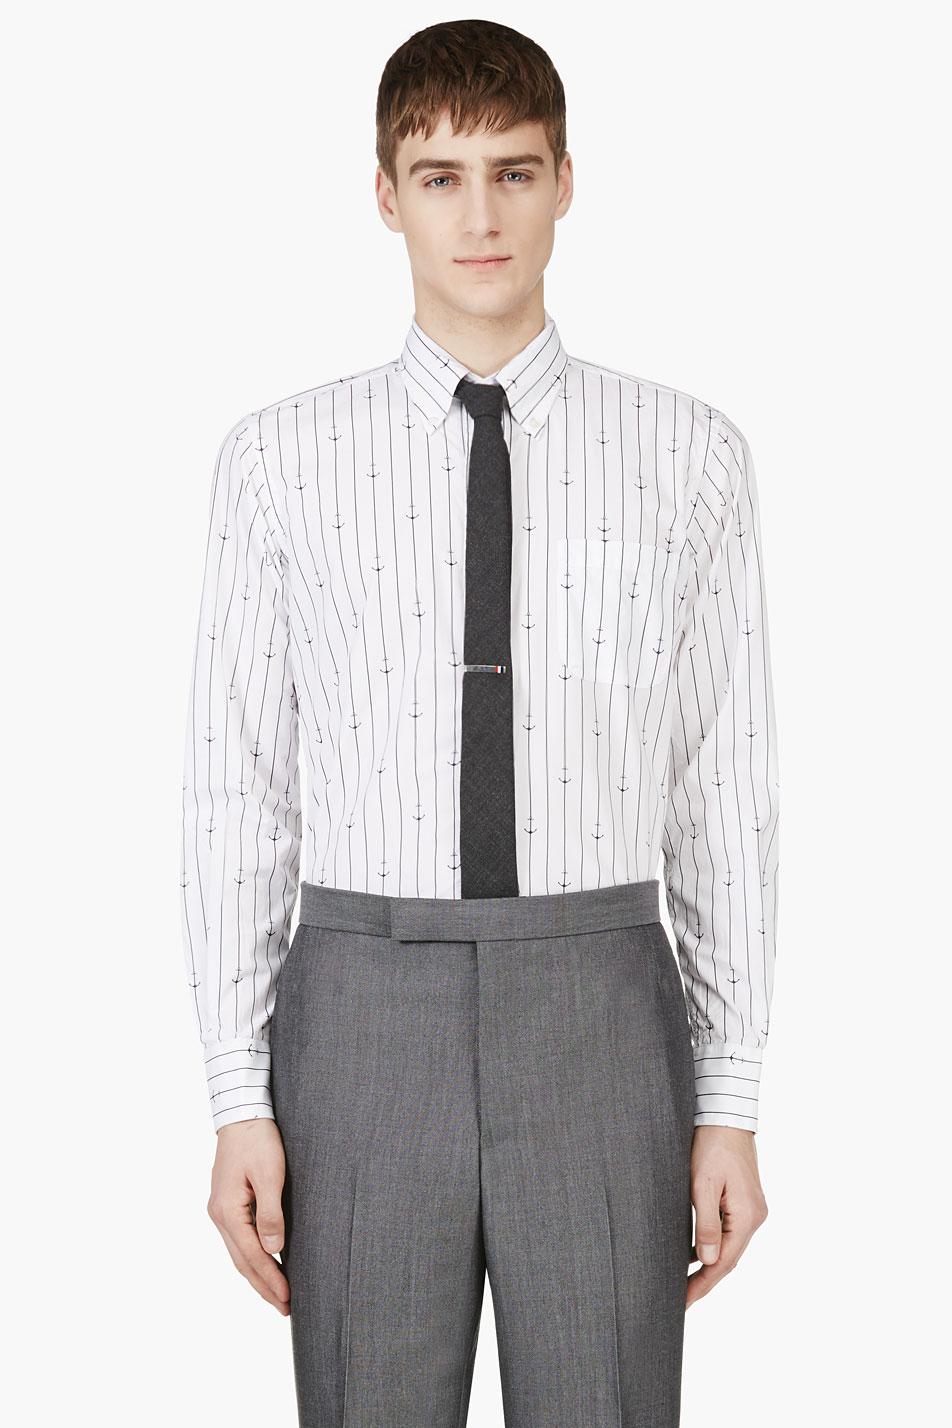 Thom browne white anchor and stripe print shirt for Thom browne white shirt